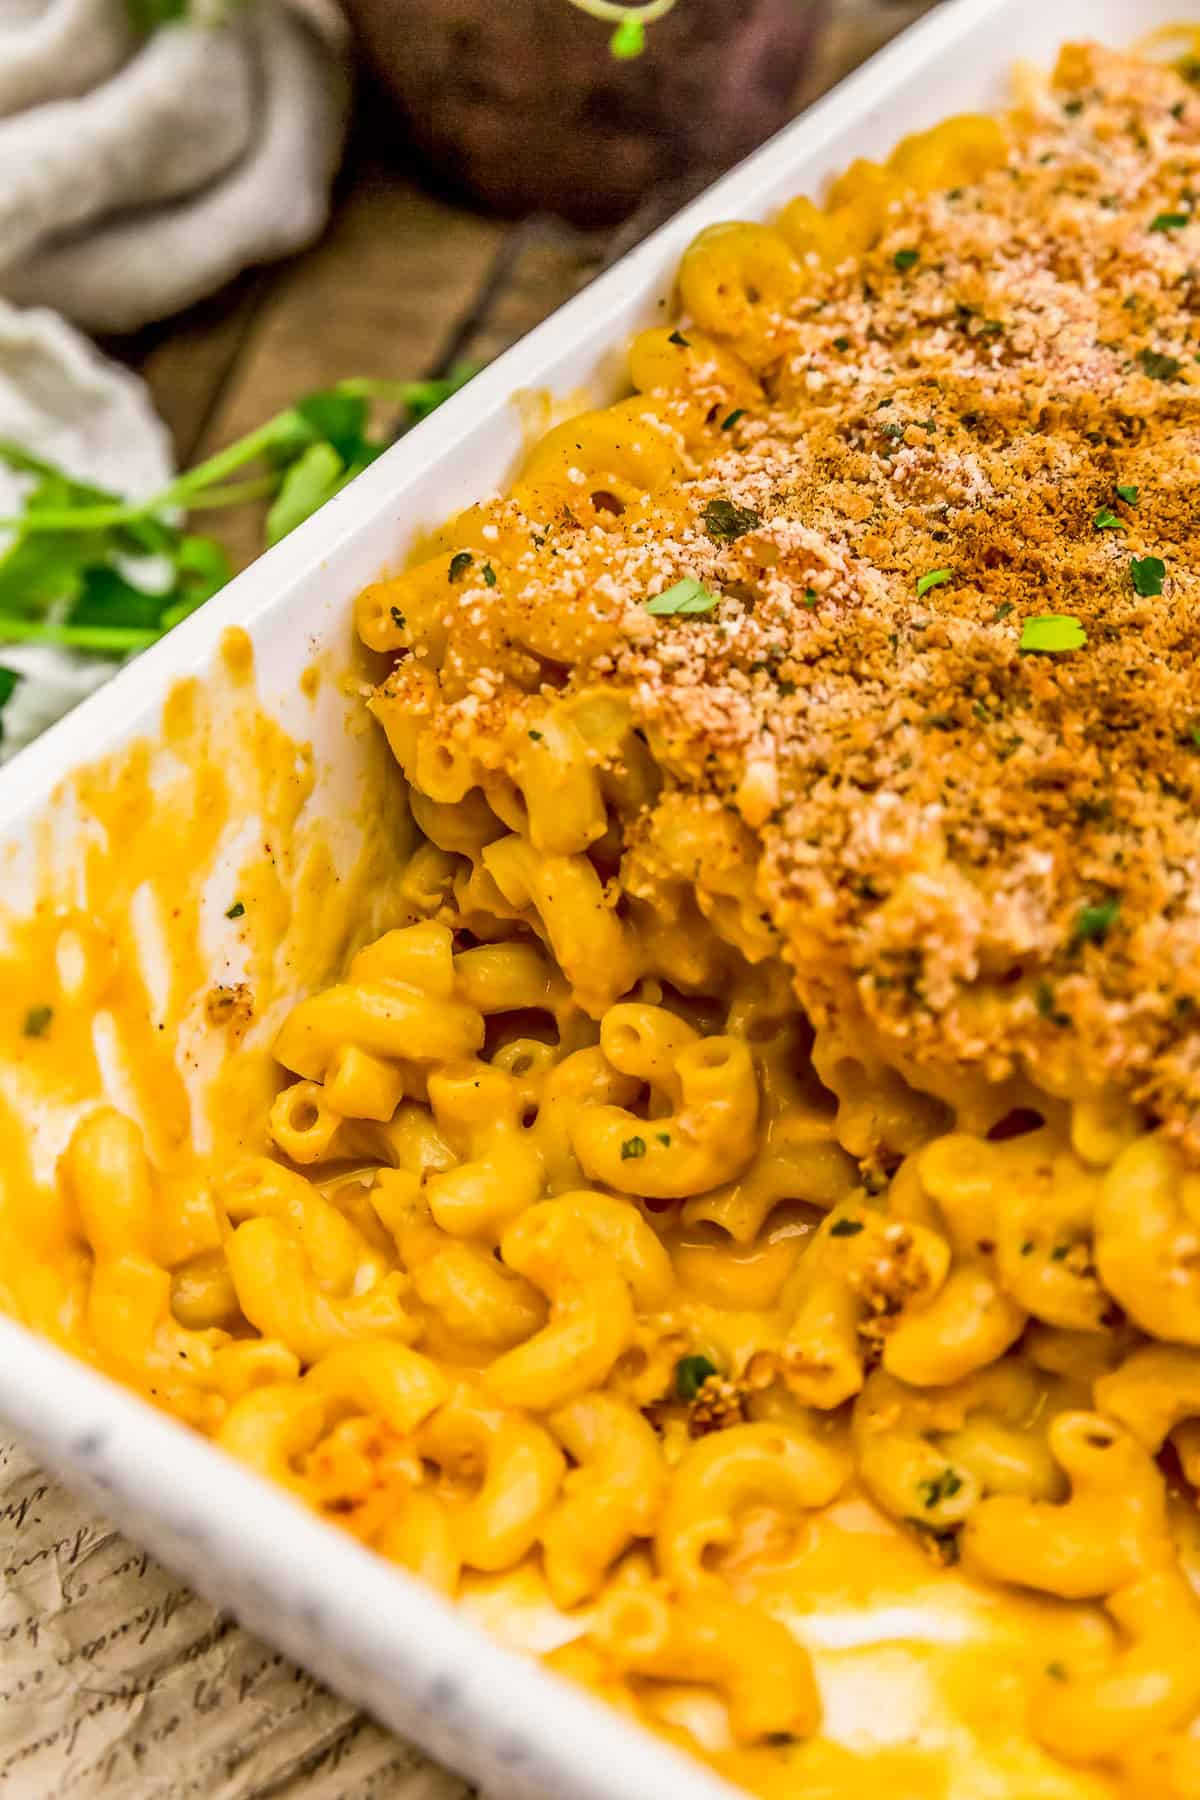 Casserole dish with Vegan Cauliflower Mac and Cheese